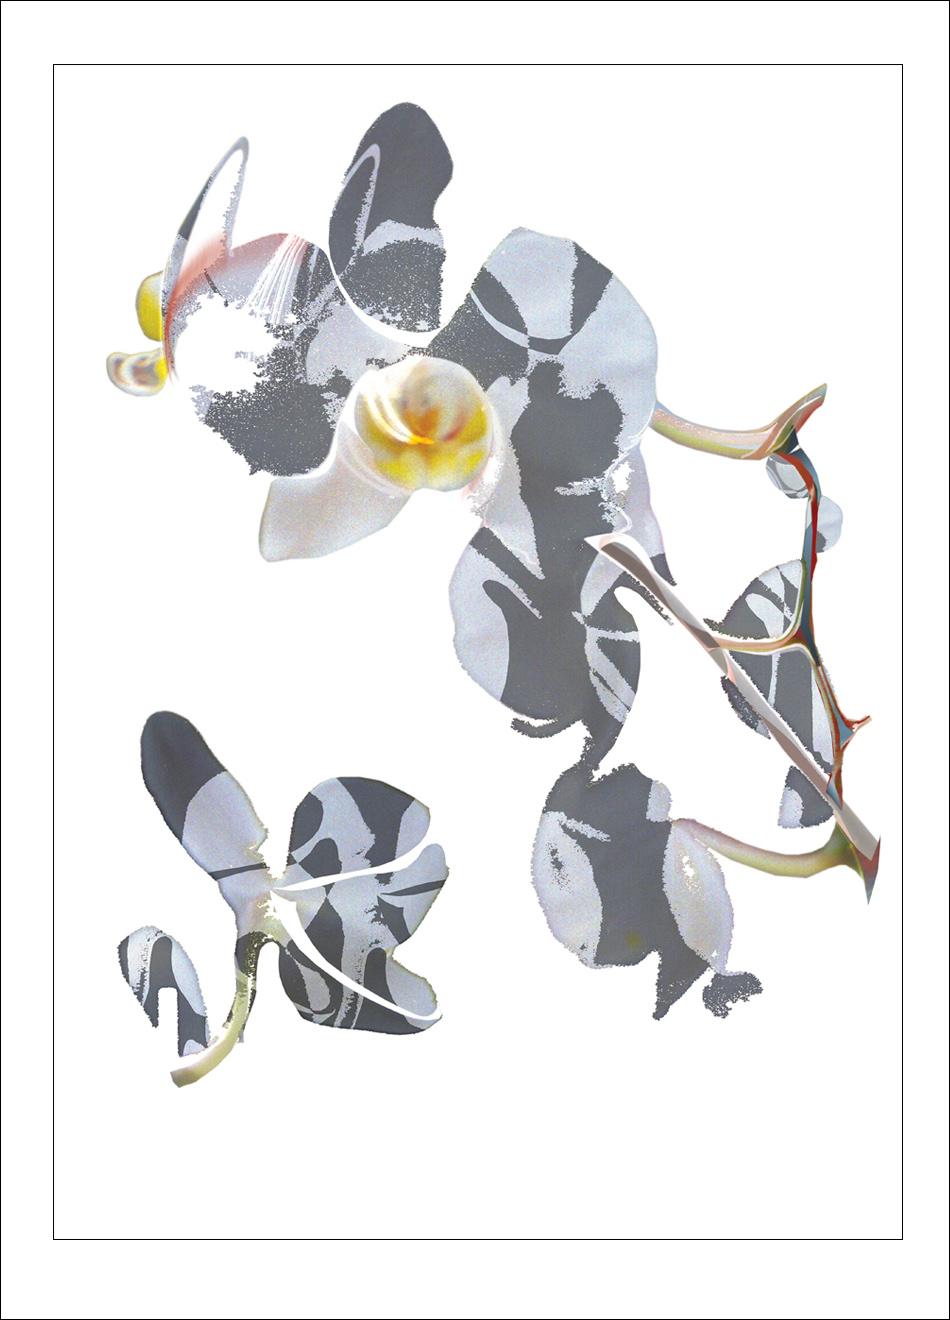 Blue Orchid Tom Manley artwork